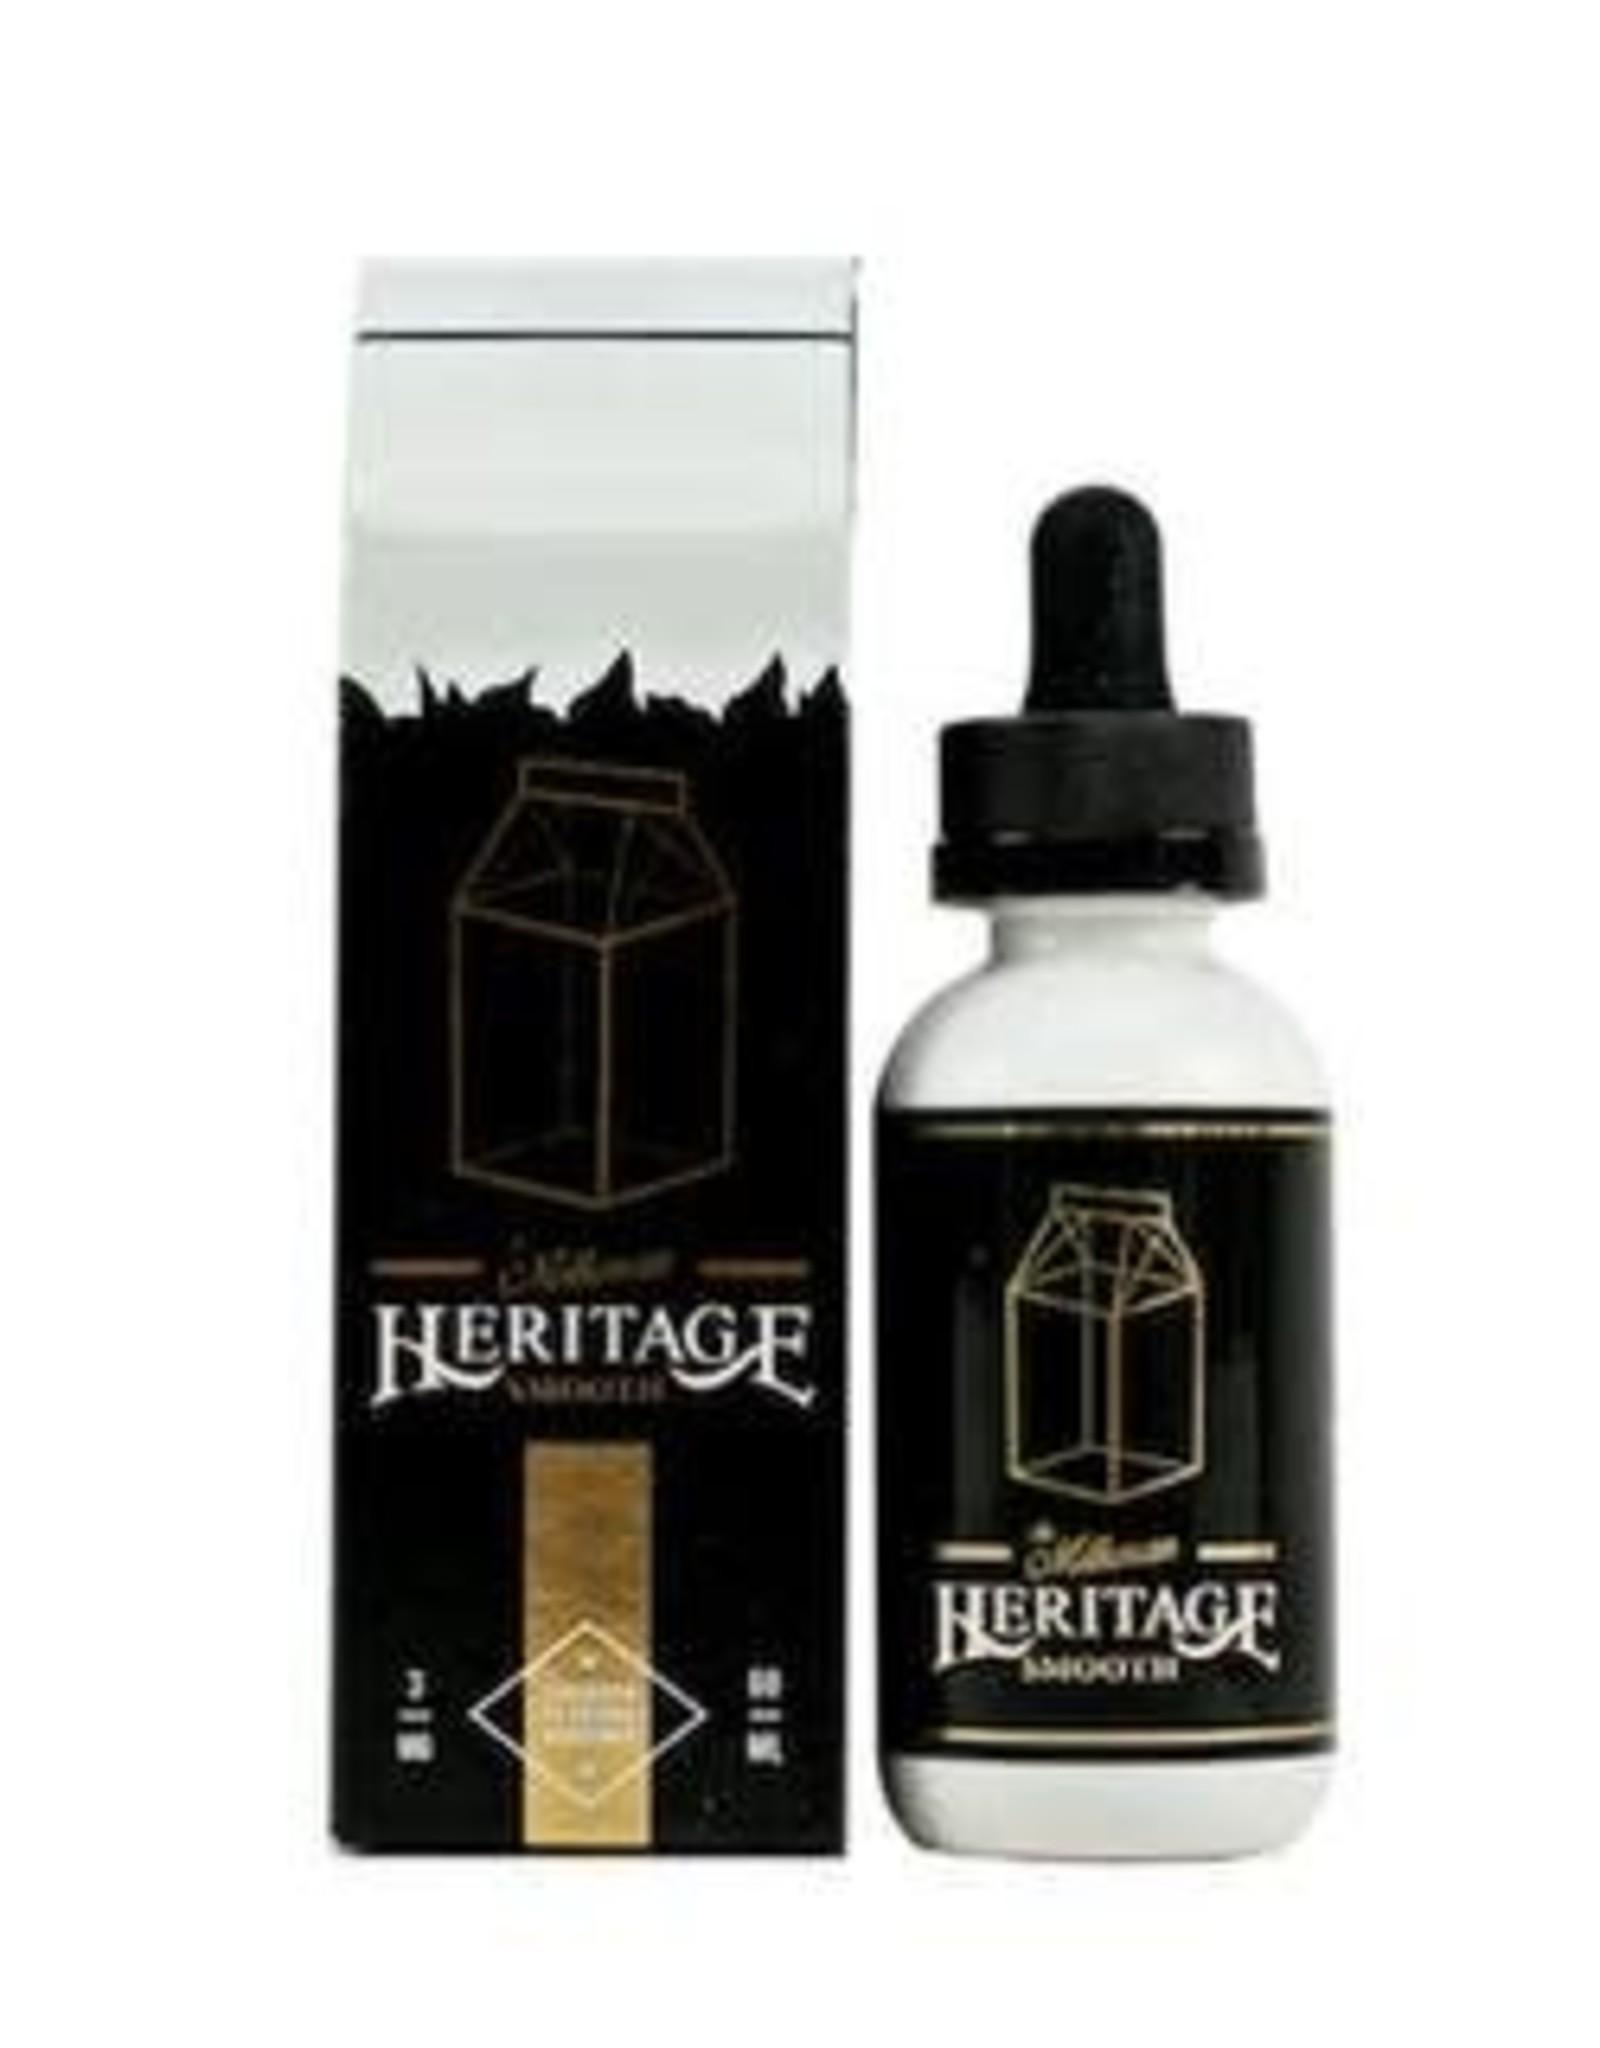 The Milkman Heritage - Smooth (60mL)